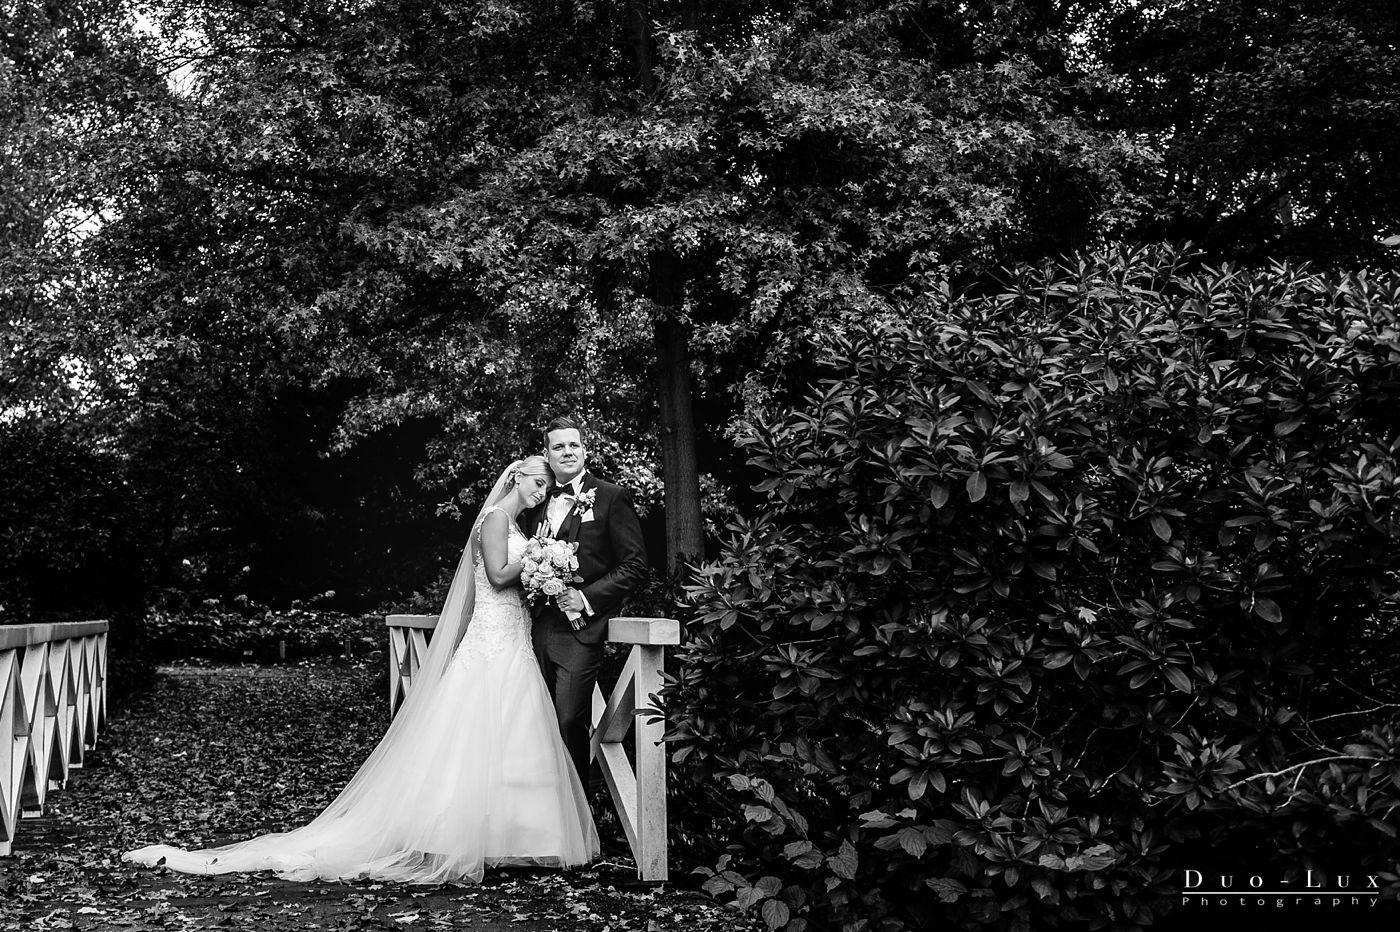 Heiraten auf Schloss Moyland